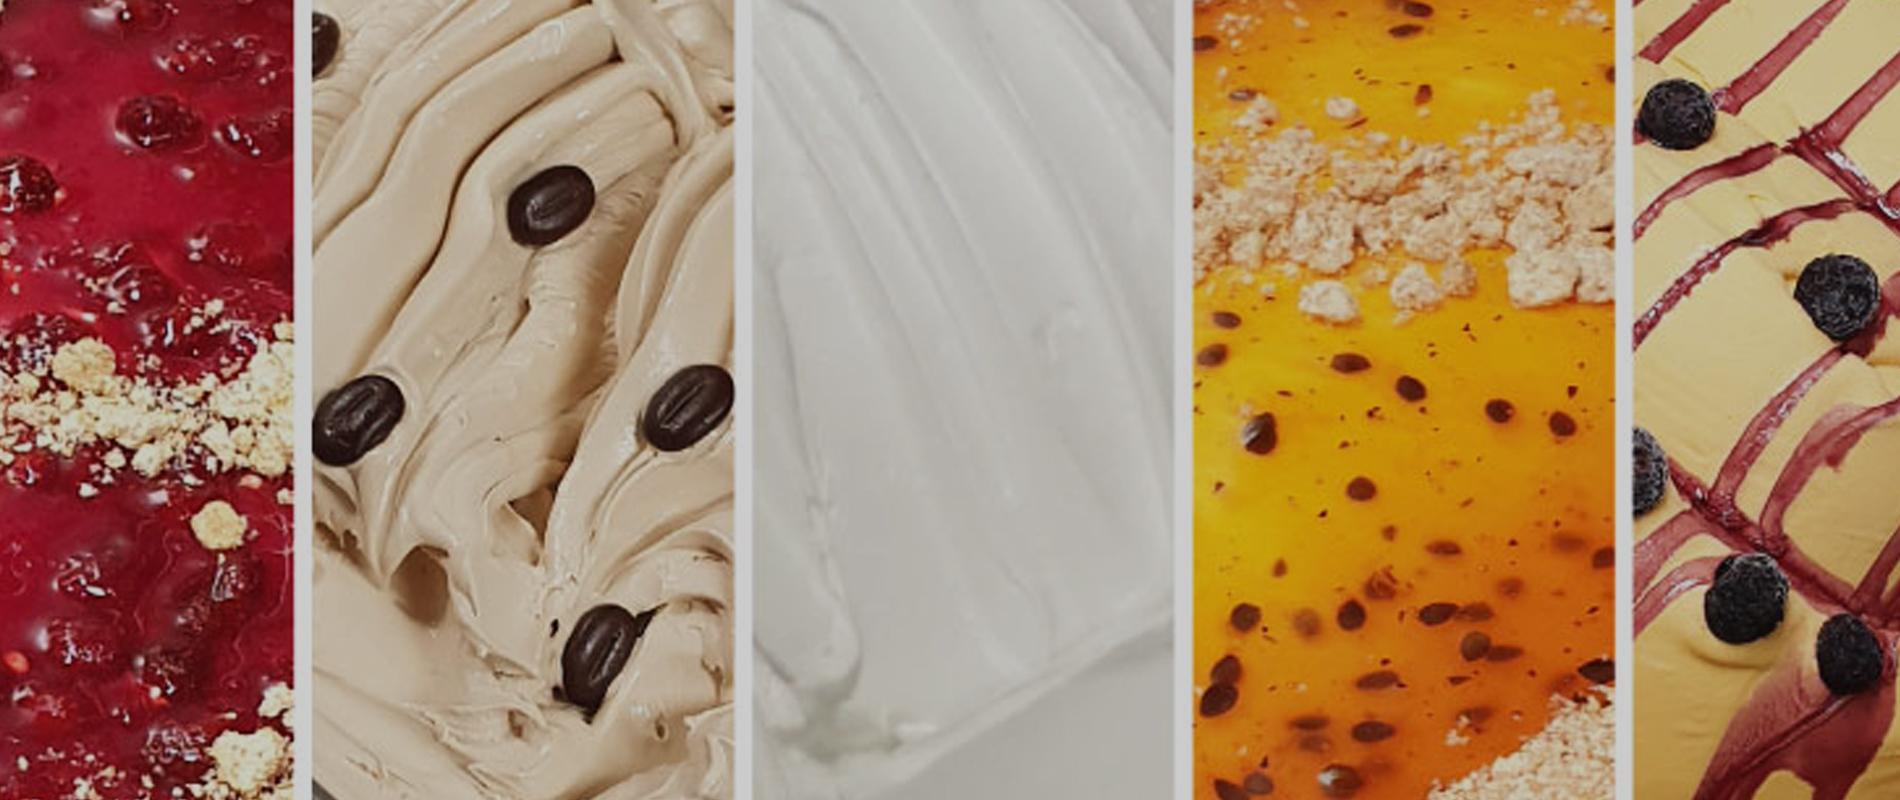 La gelateria italiana